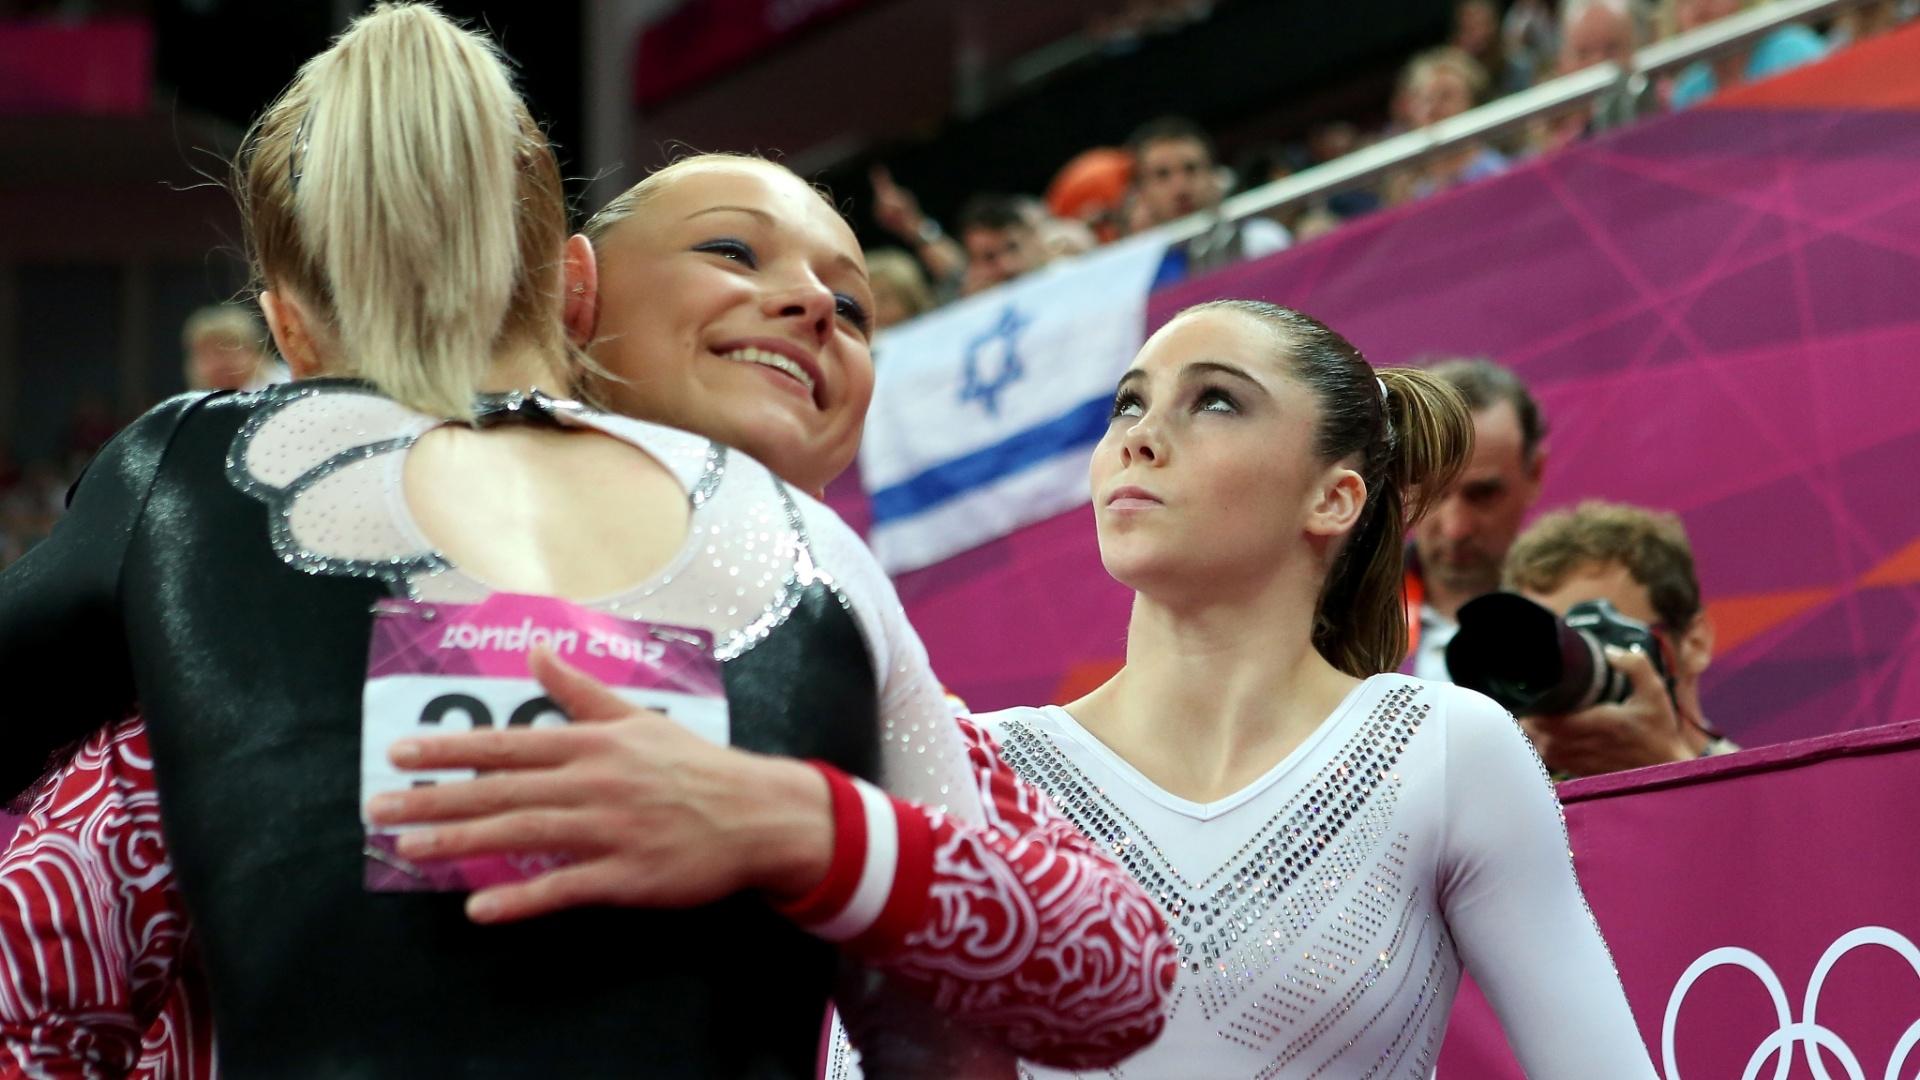 Campeã de salto Sandra Izbasa (de costas) recebe os cumprimentos da medalhista de bronze Maria Paseka enquanto a vice McKayla Maroney faz cara feia